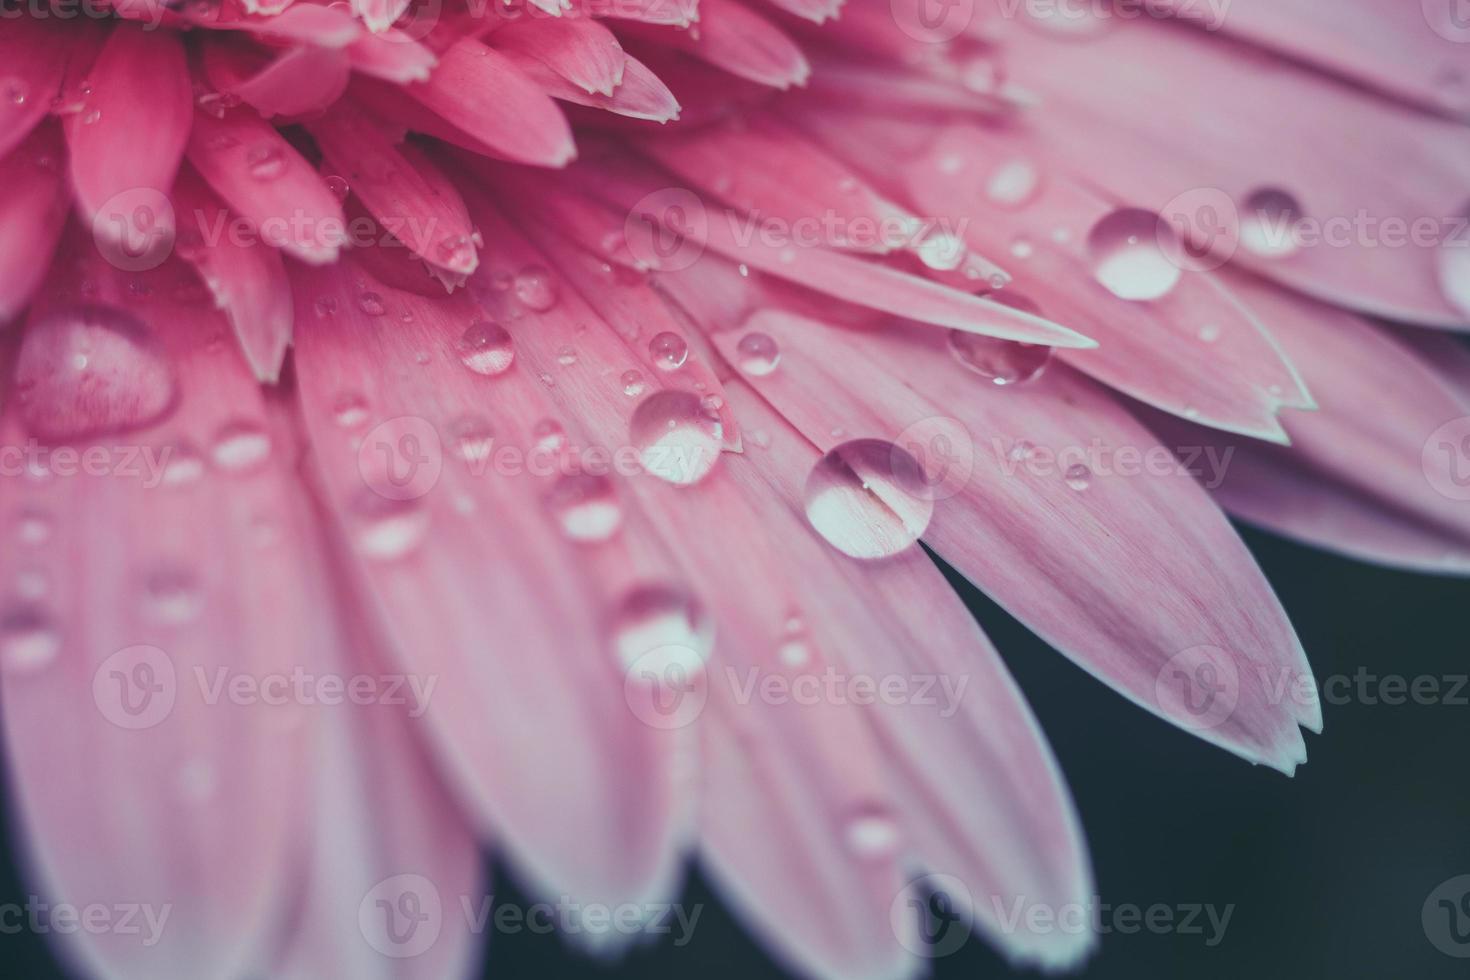 blommor med filtereffekt retro vintage stil foto